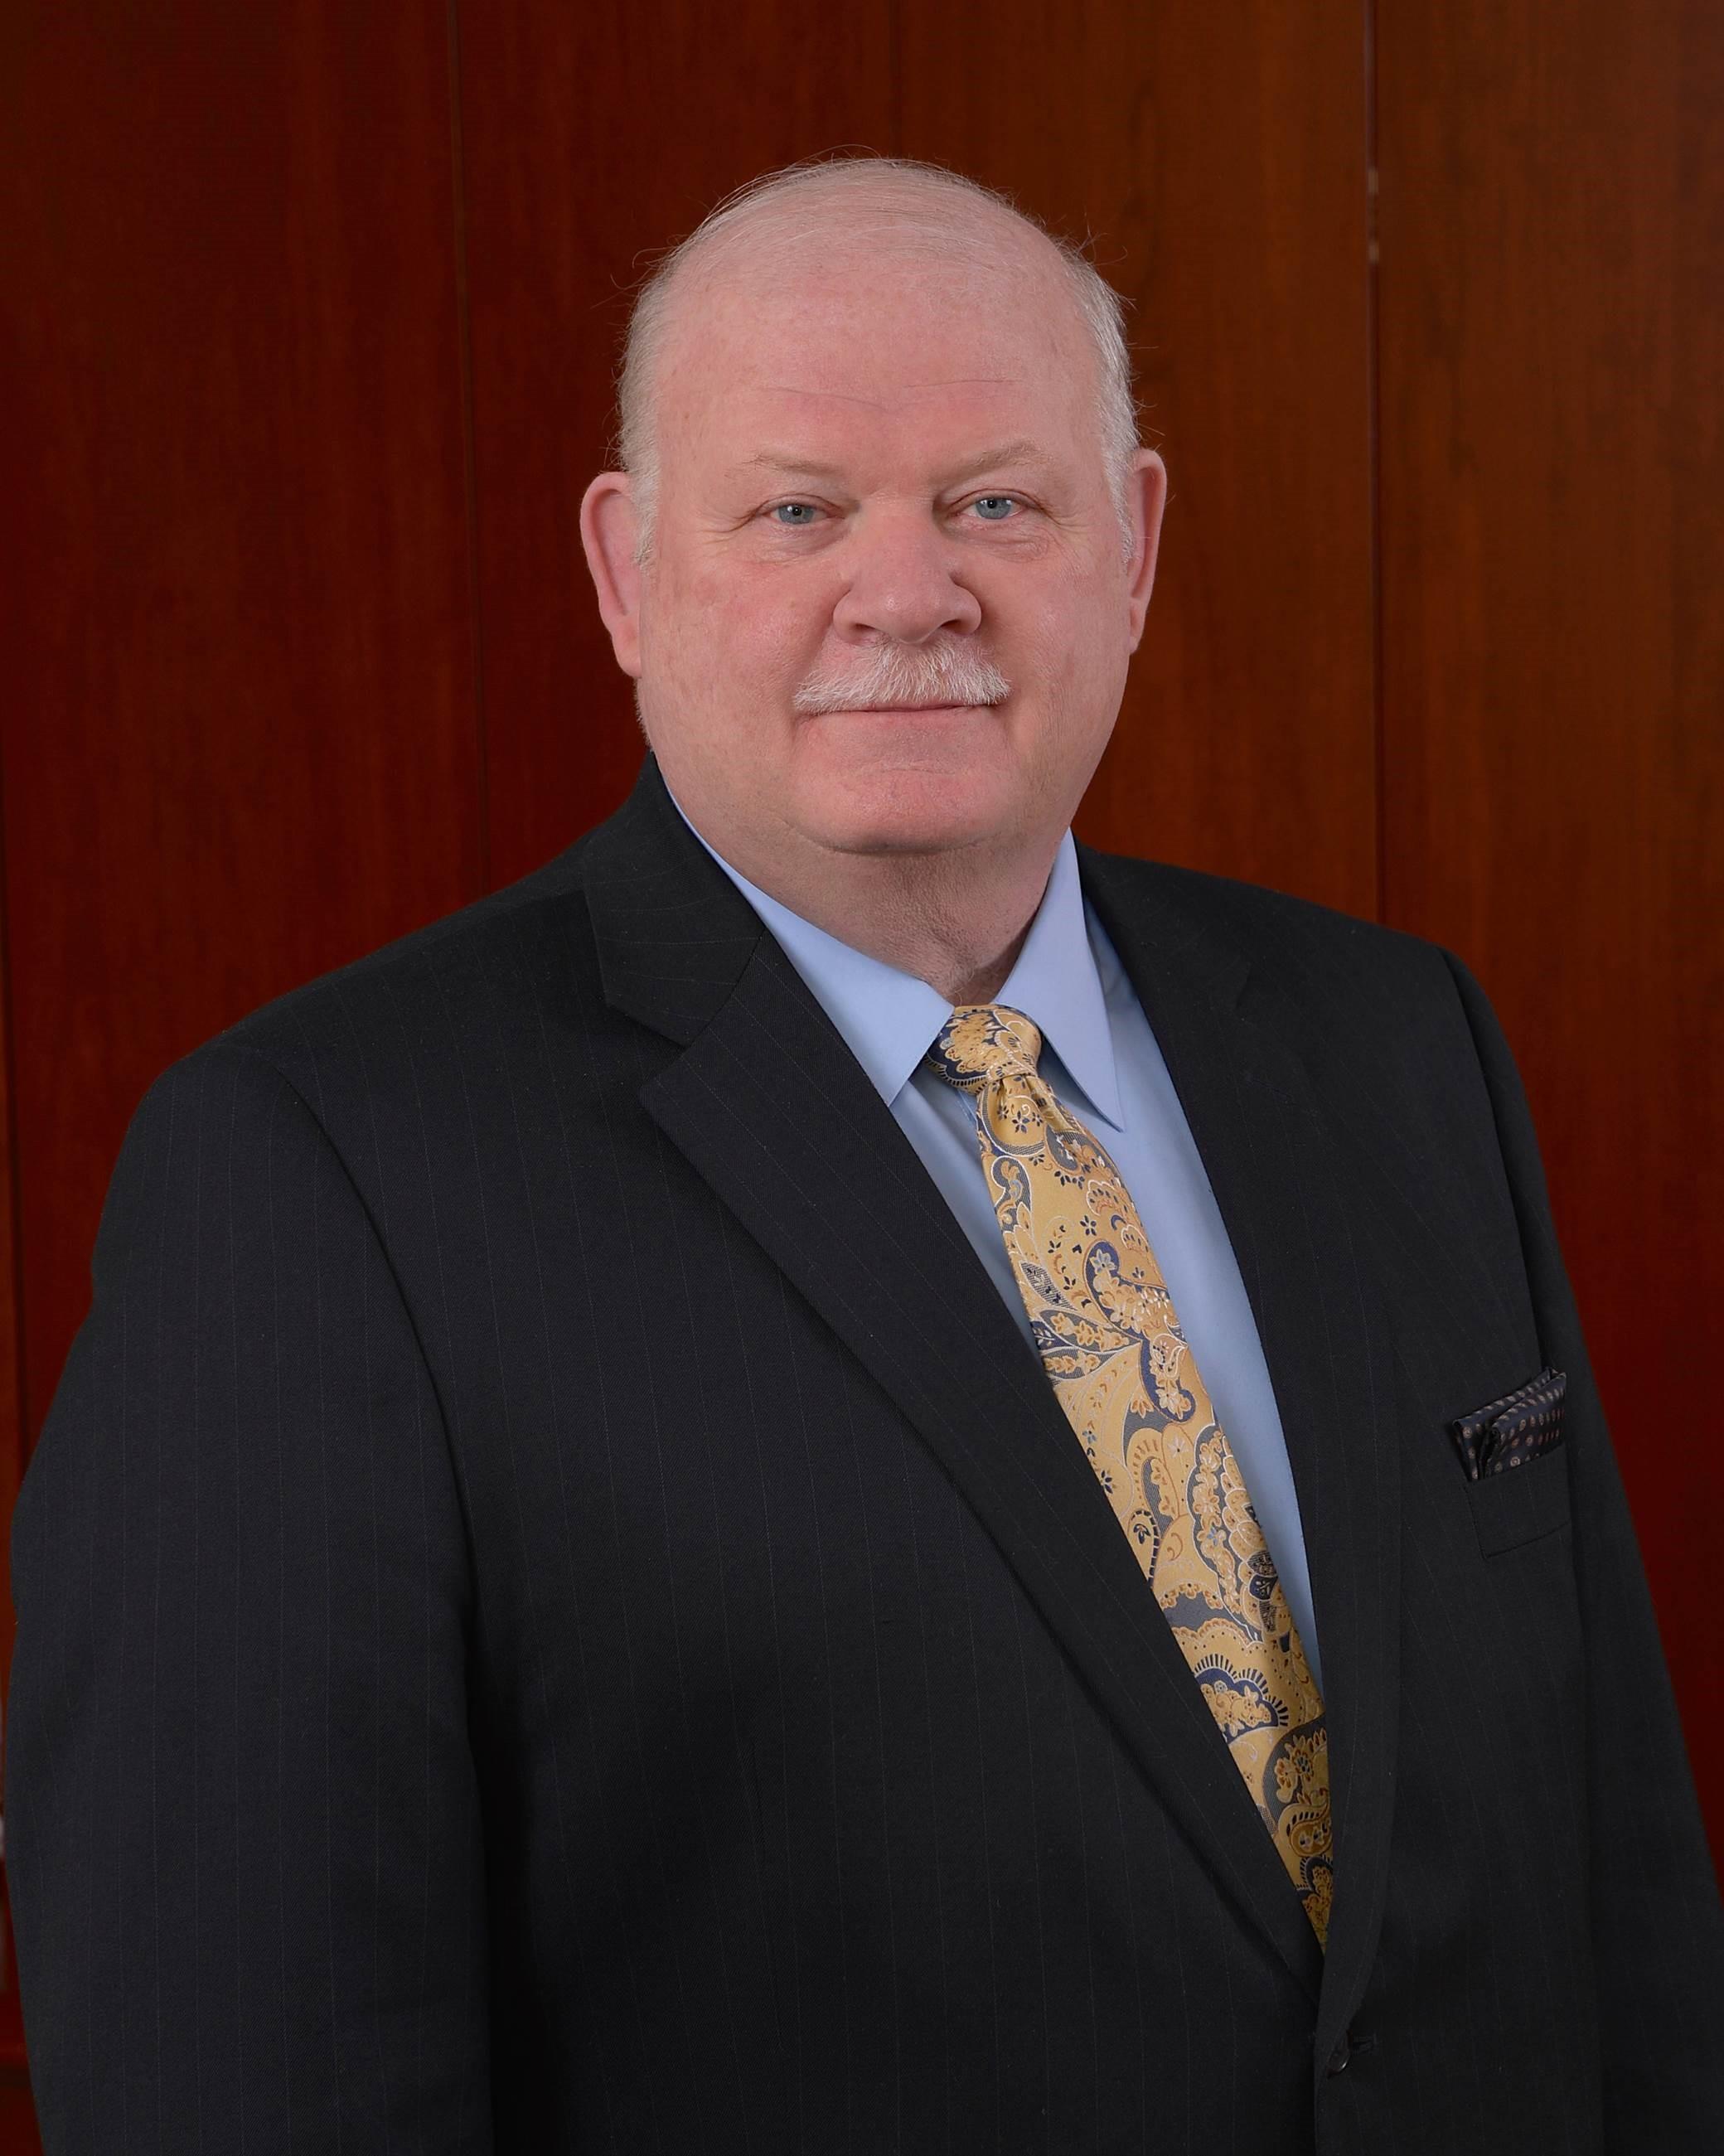 Norman G. Roth, President, Greenwich Hospital. Annual salary $2.85 million